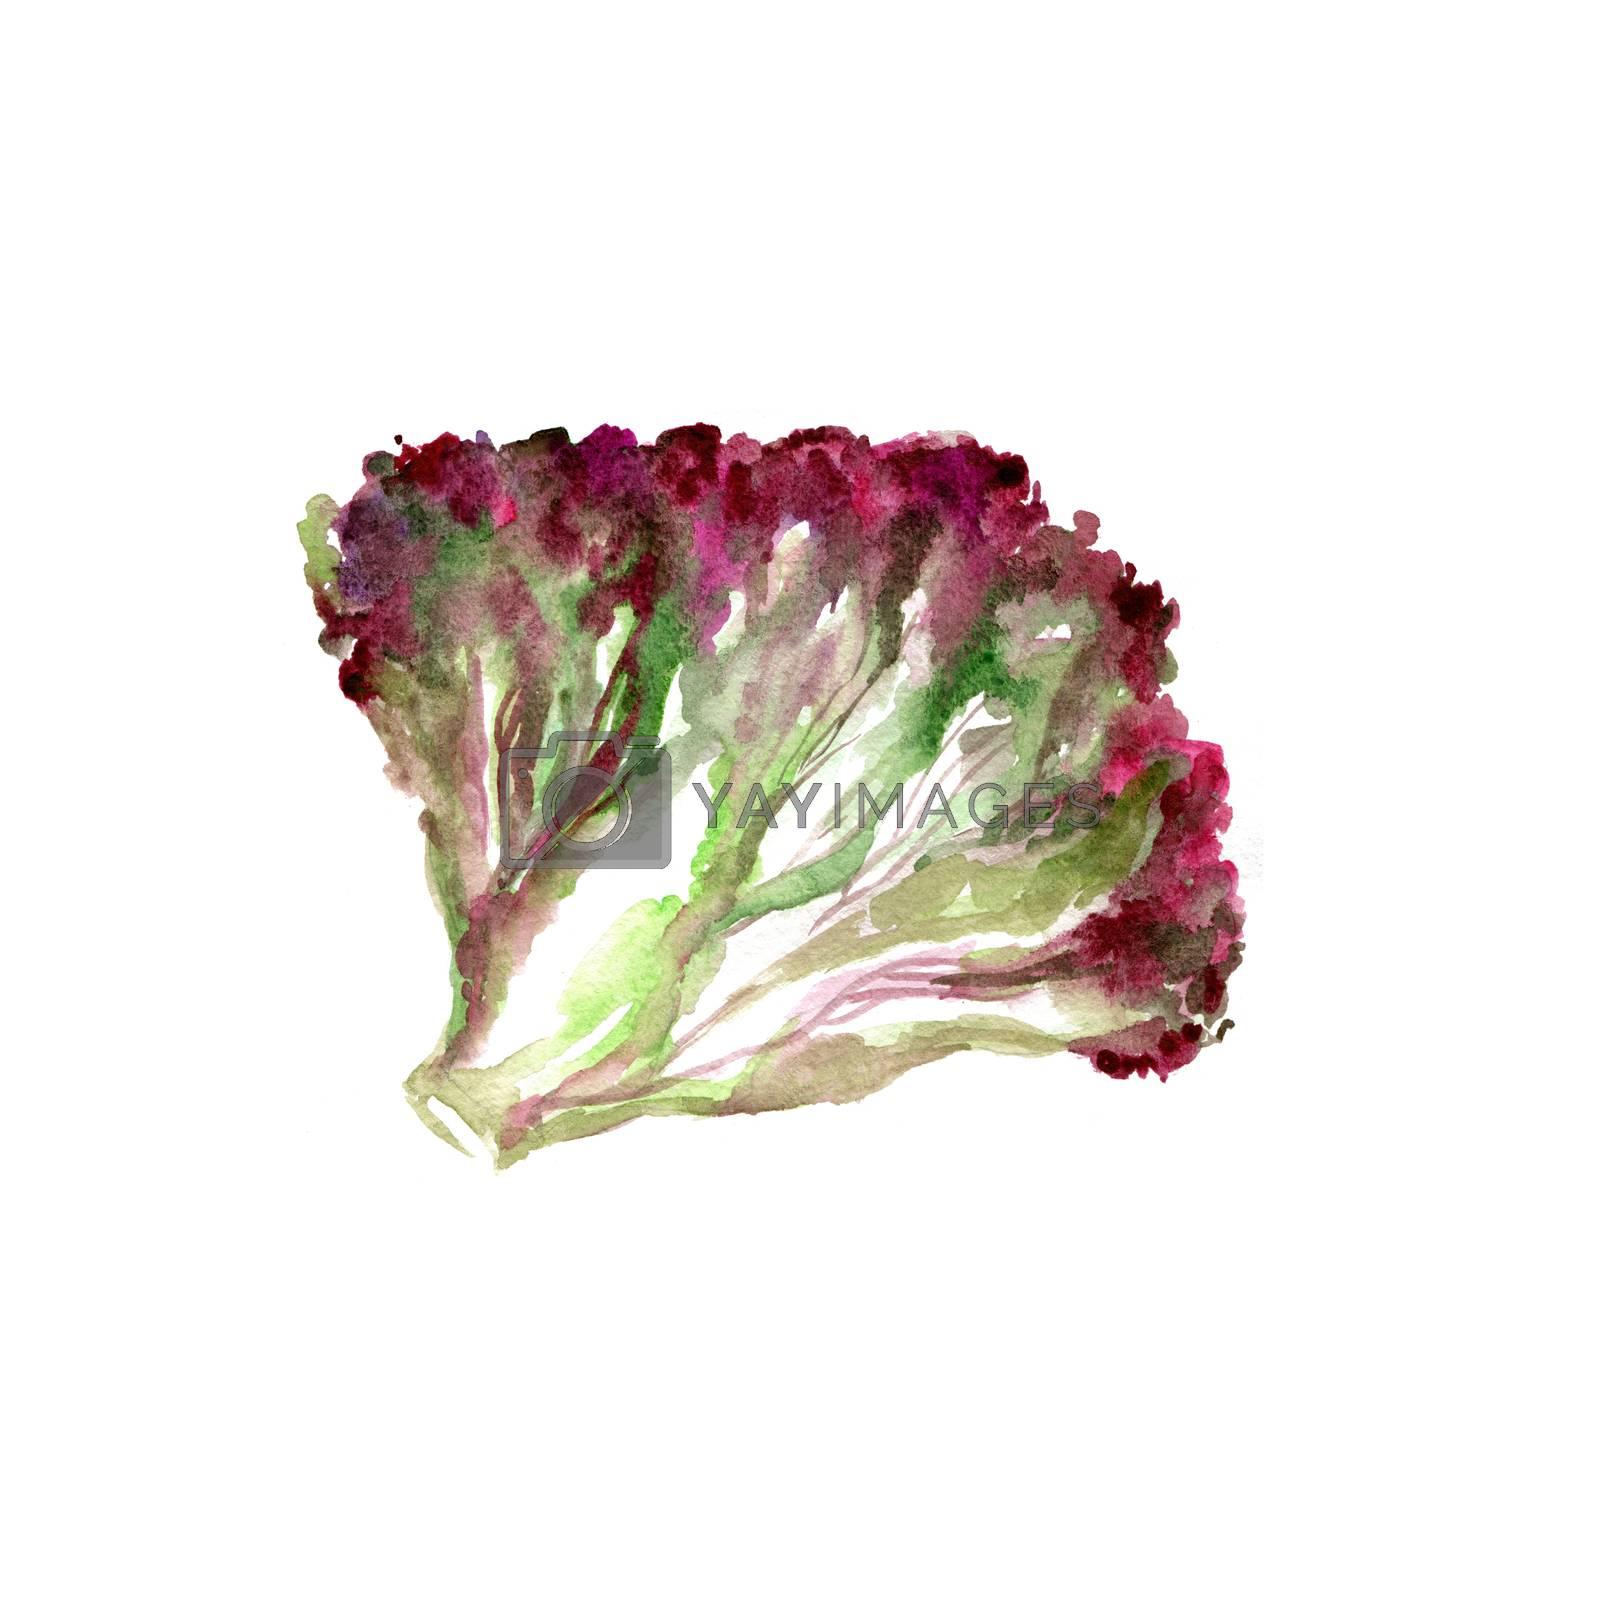 Watercolor Lettuce Leaves. Hand Drawn Illustration Organic Food Vegetarian Ingredient